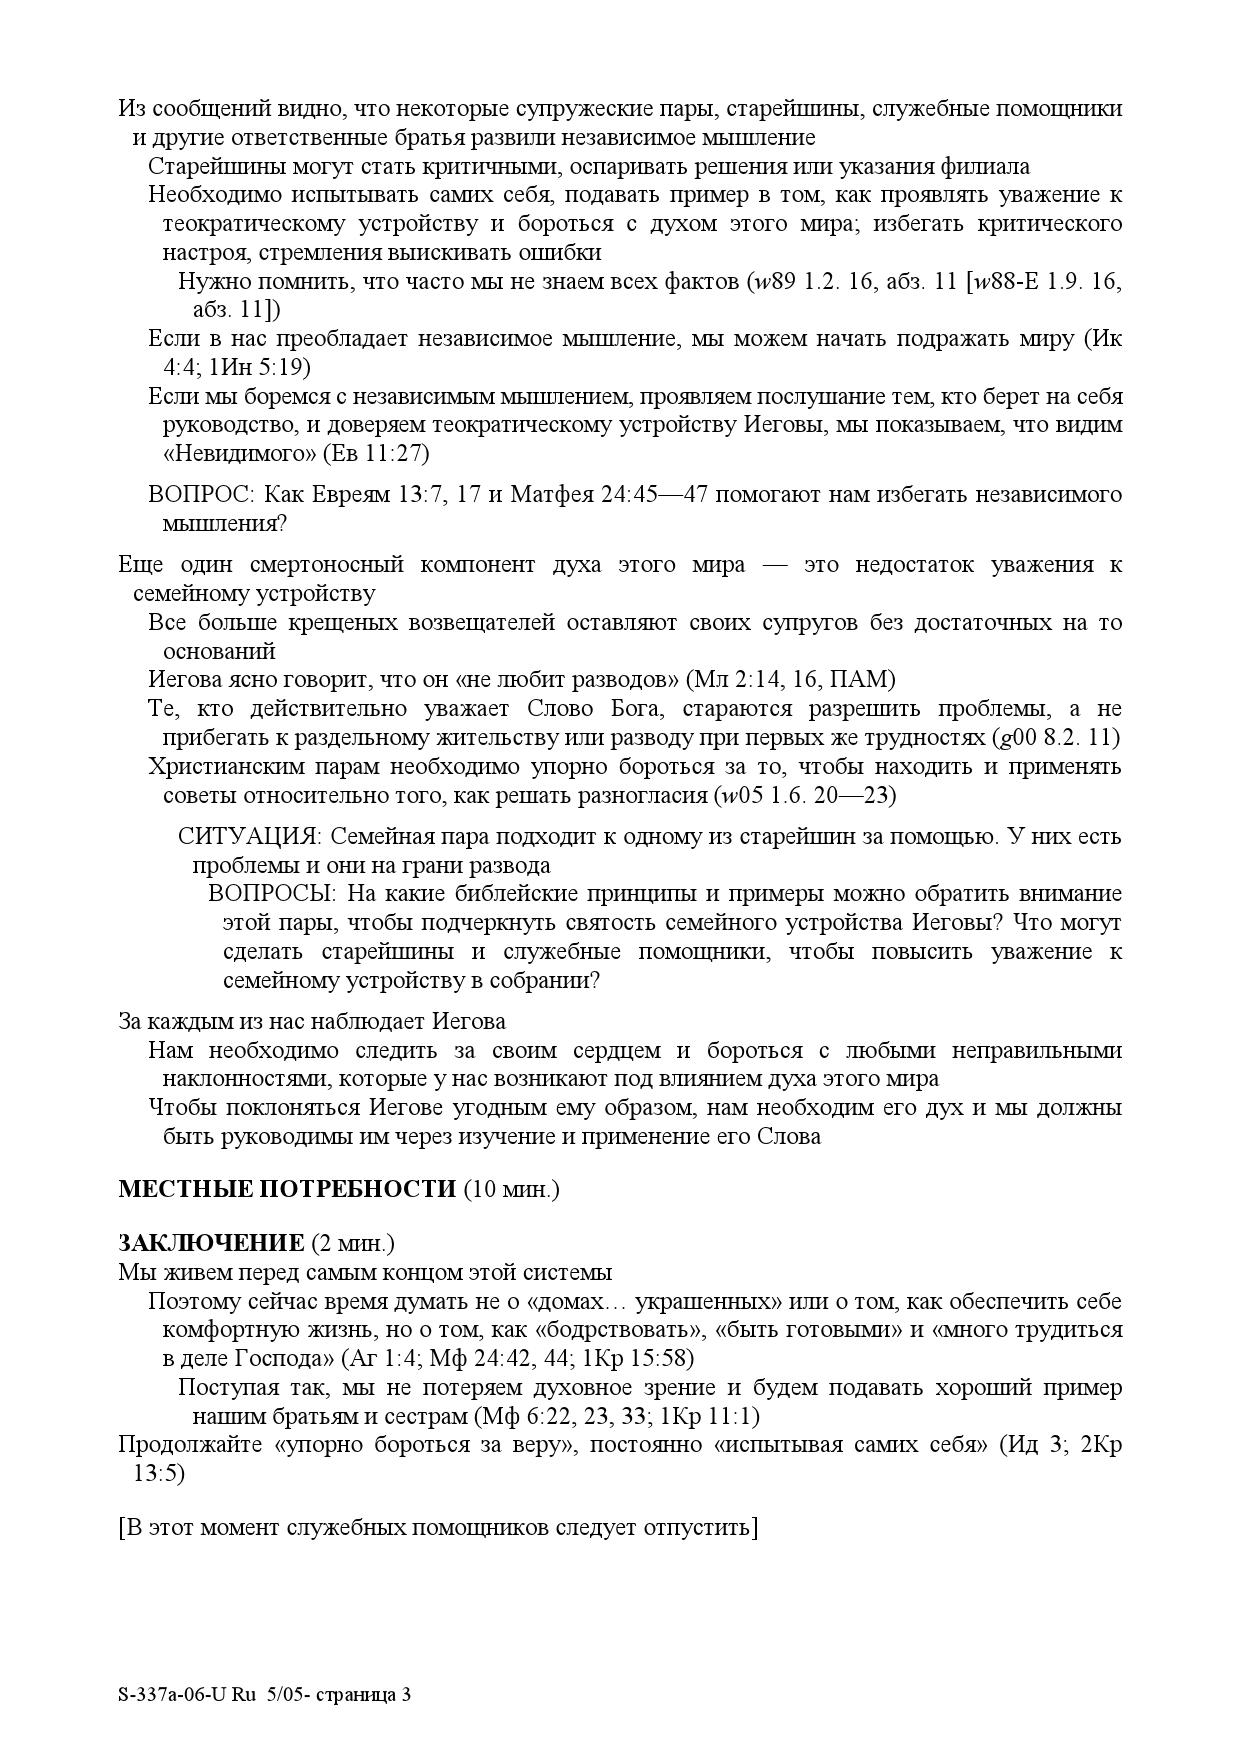 S-337-U-5-05 (конец, ВО, независ.мышл)_000003